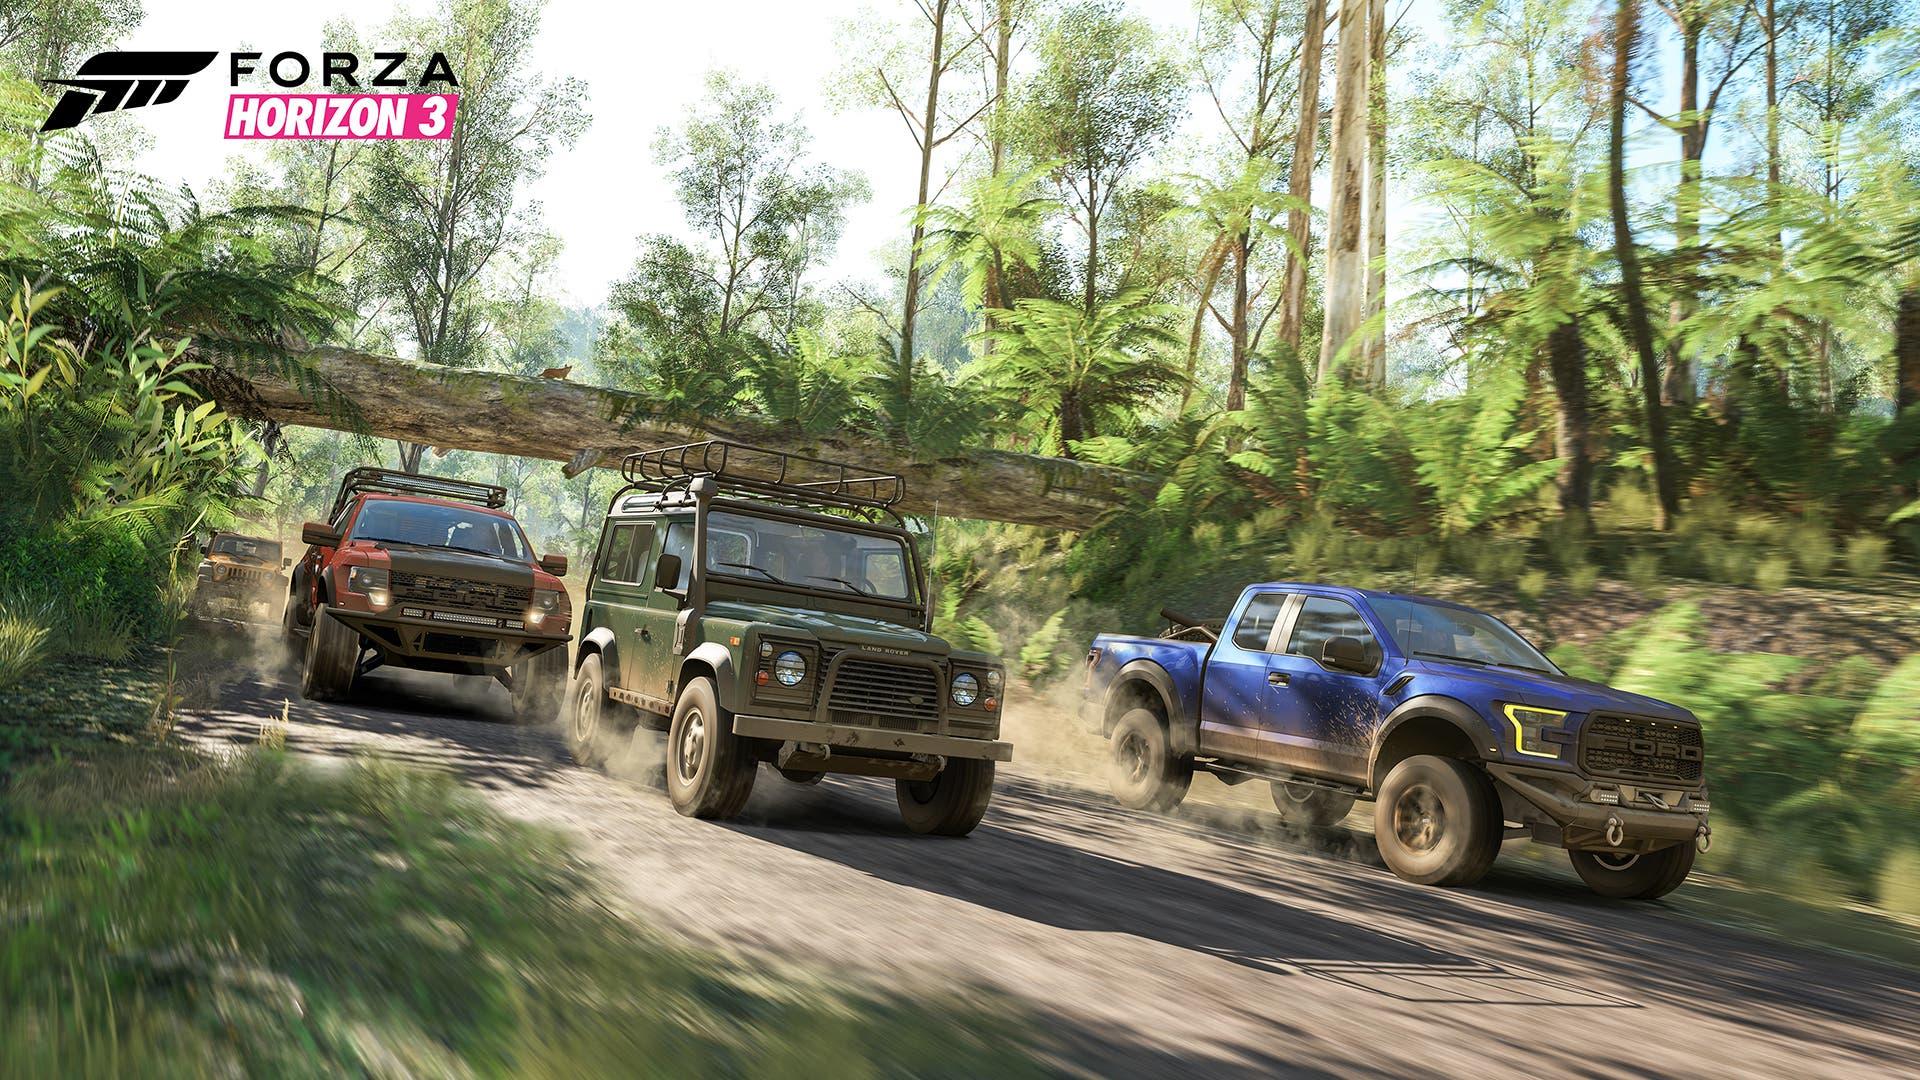 Forza-Horizon-3-JungleTrucks